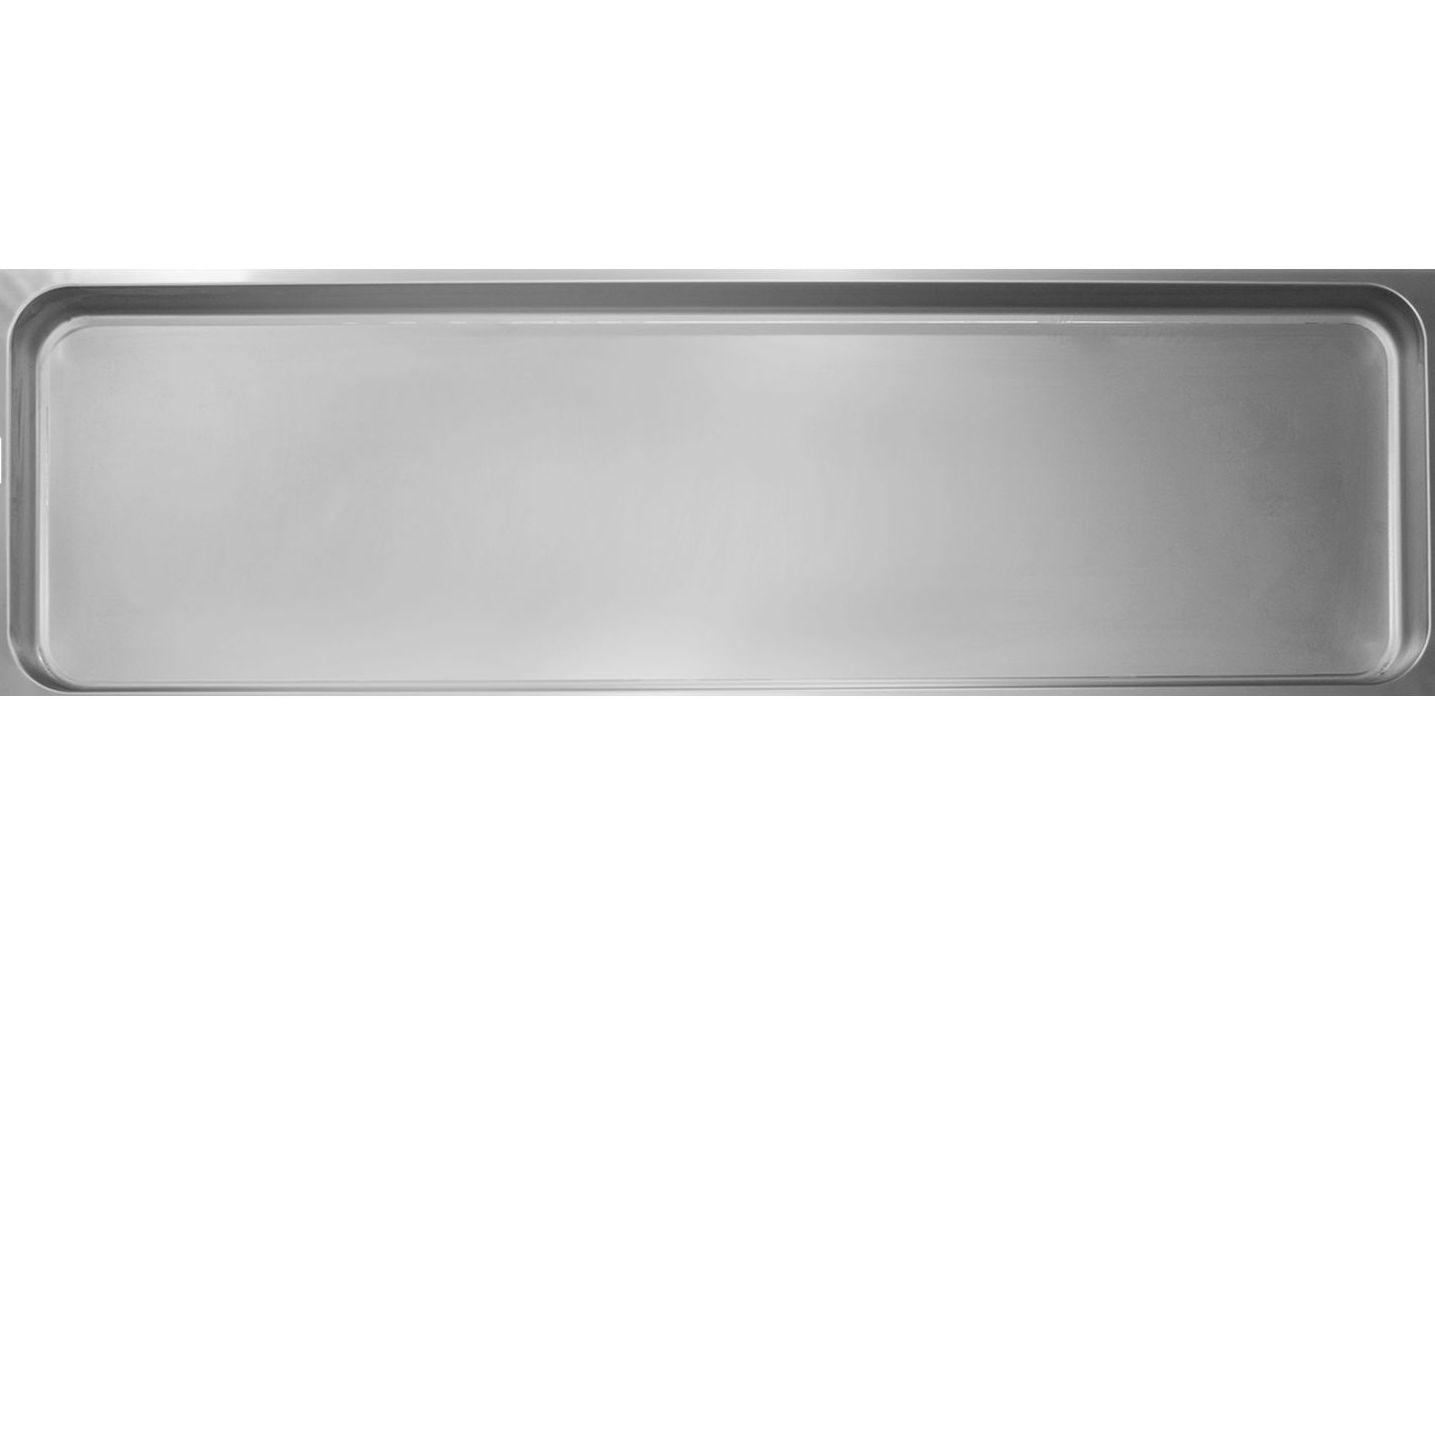 Cubeta base 6 bandejas para vitrinas sobre mostrador  : Productos   de Miracor